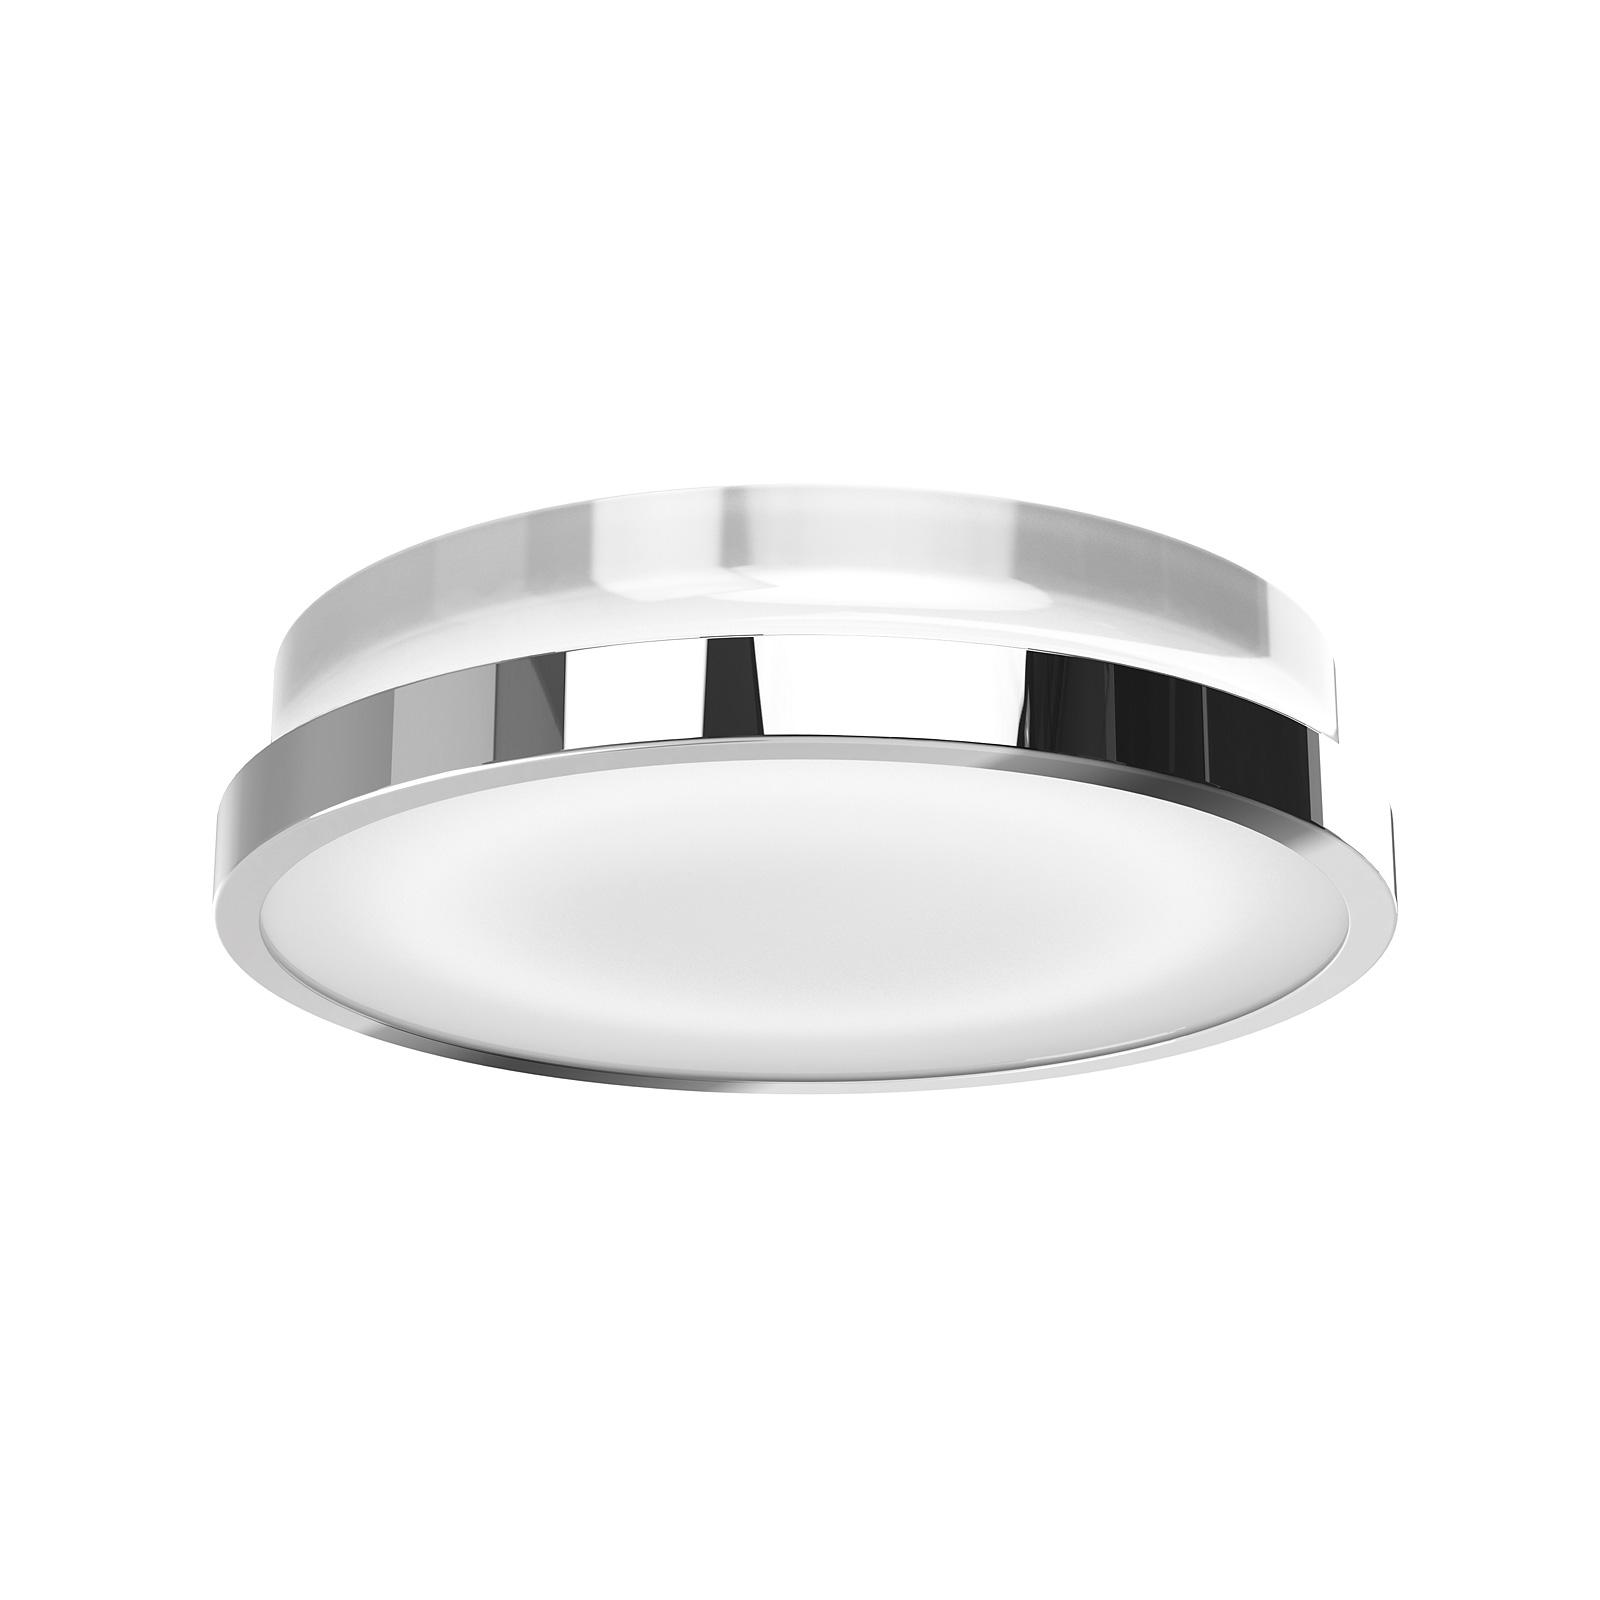 osram rondel led deckenleuchte 20 watt 930 lumen warmwei 3000 kelvin 80 ra ip44 ebay. Black Bedroom Furniture Sets. Home Design Ideas